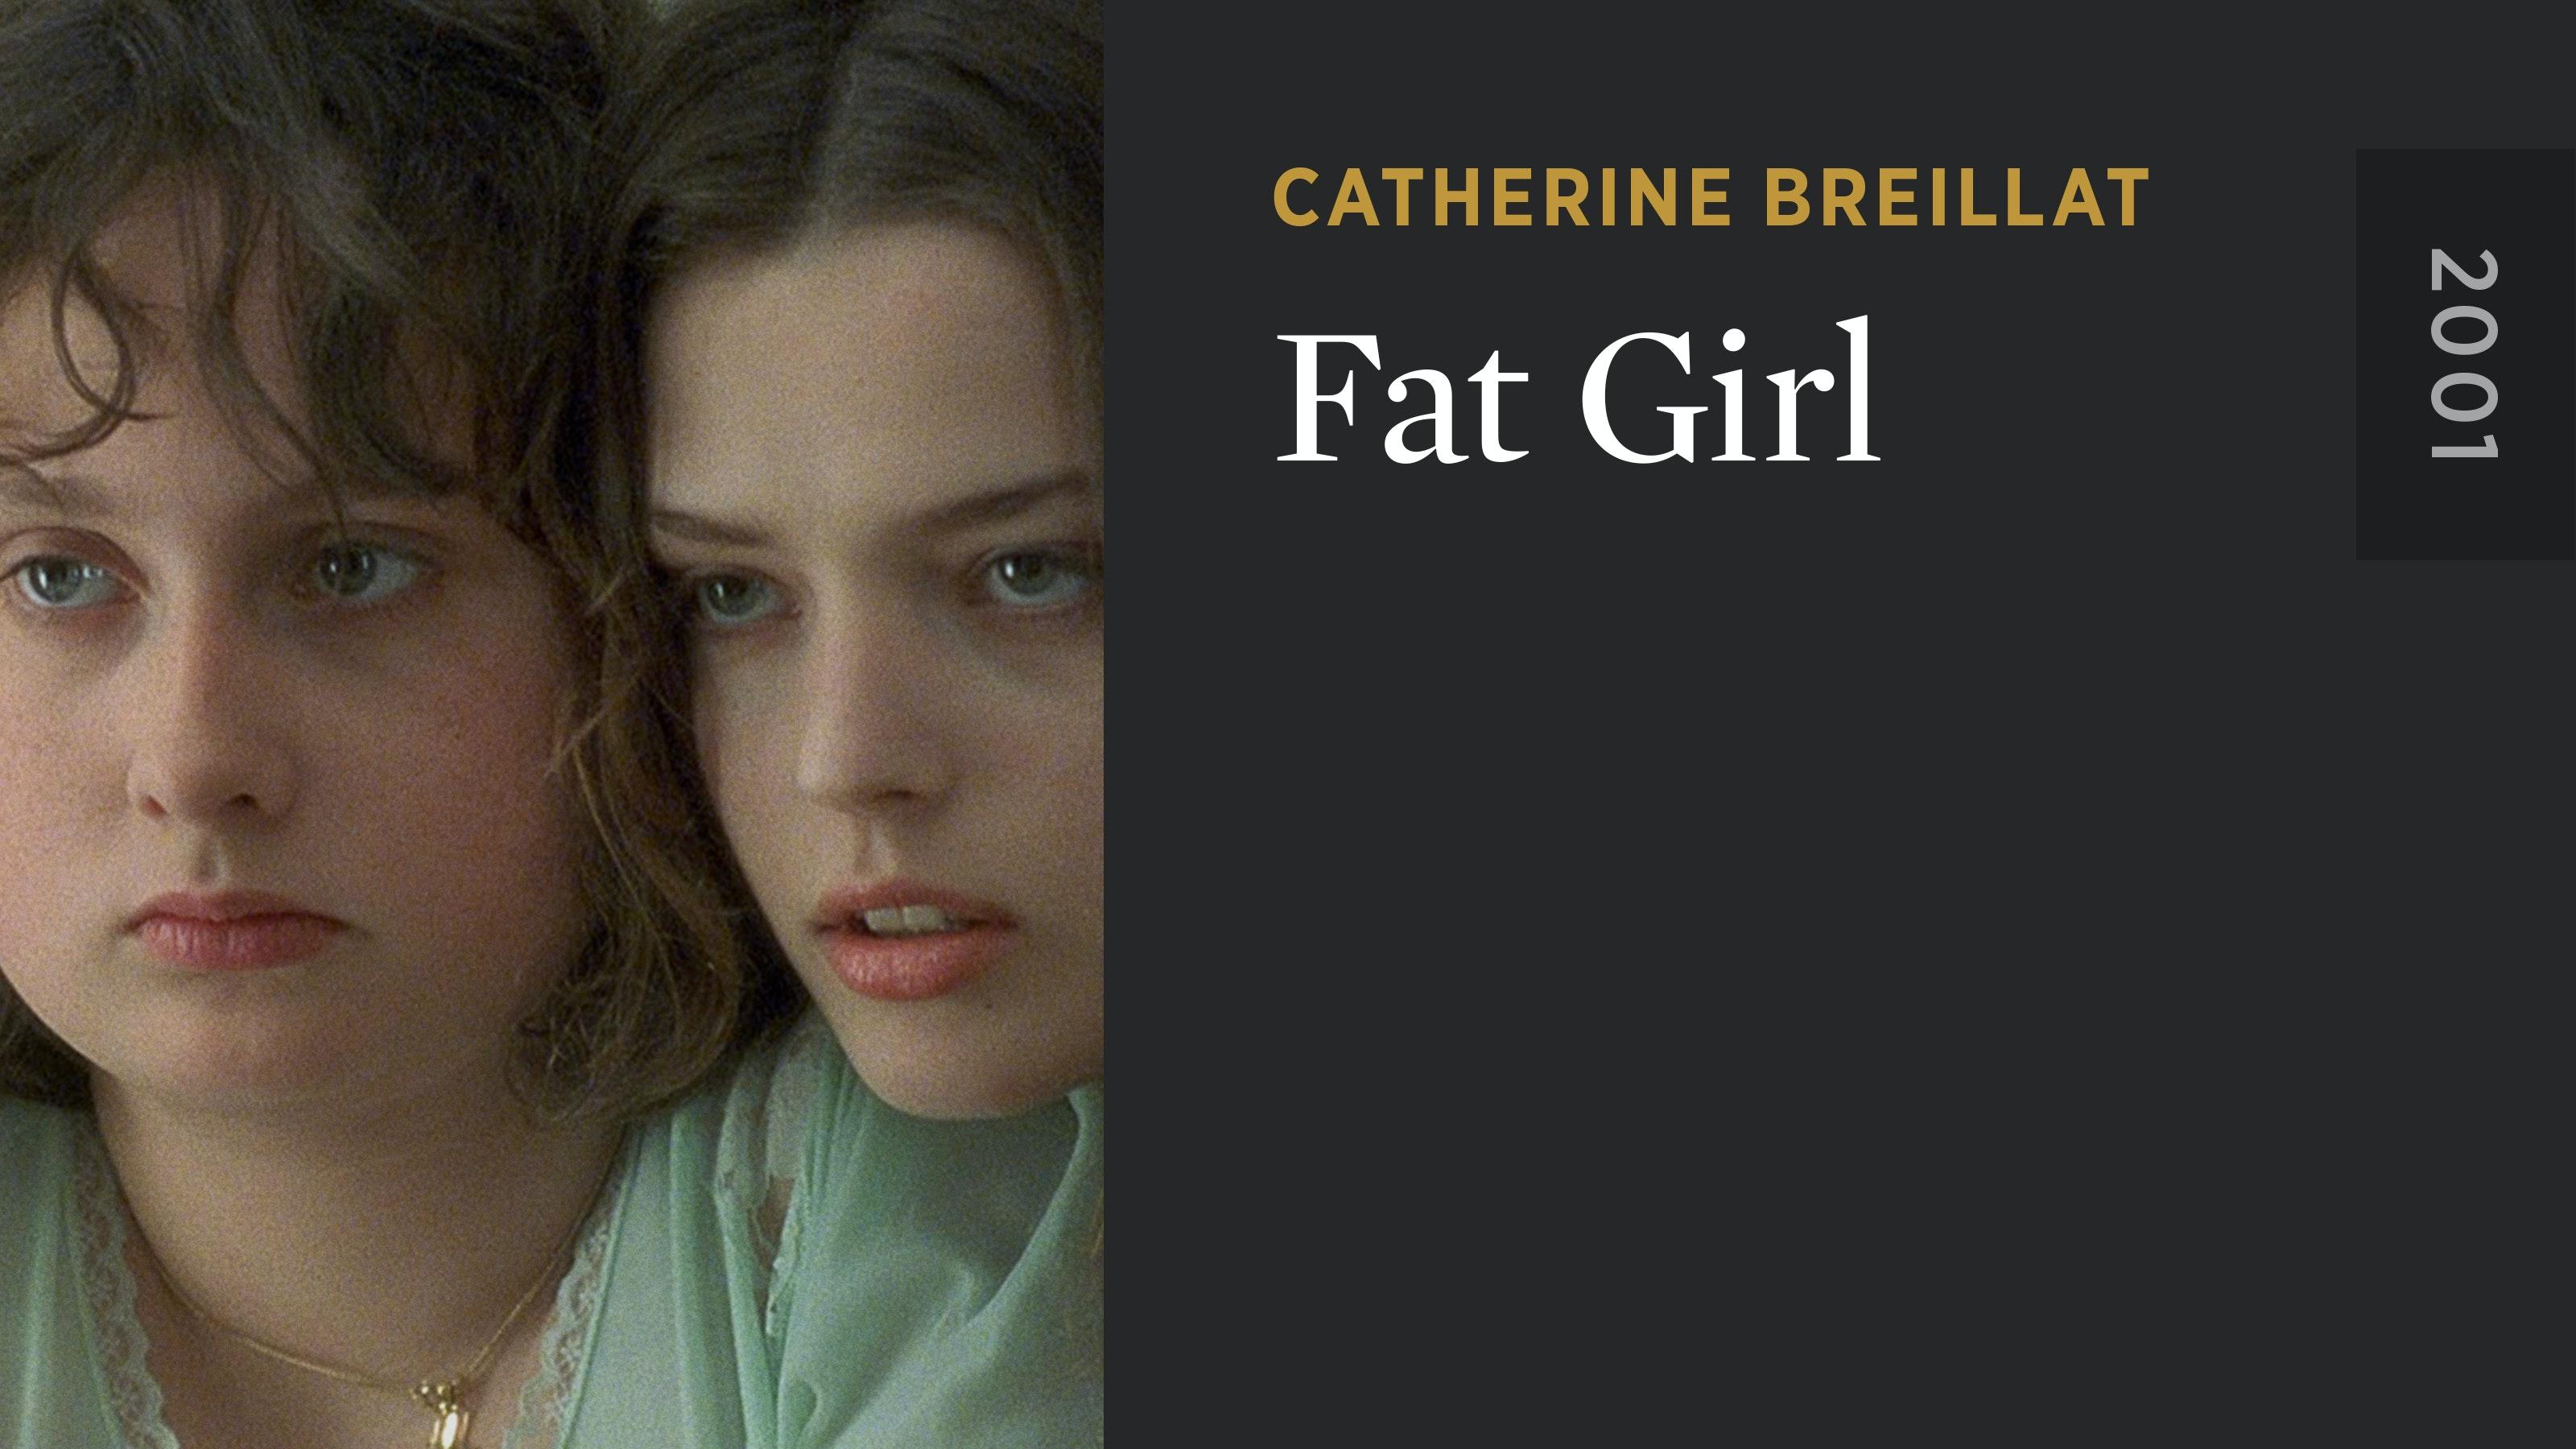 catherine breillat 2019